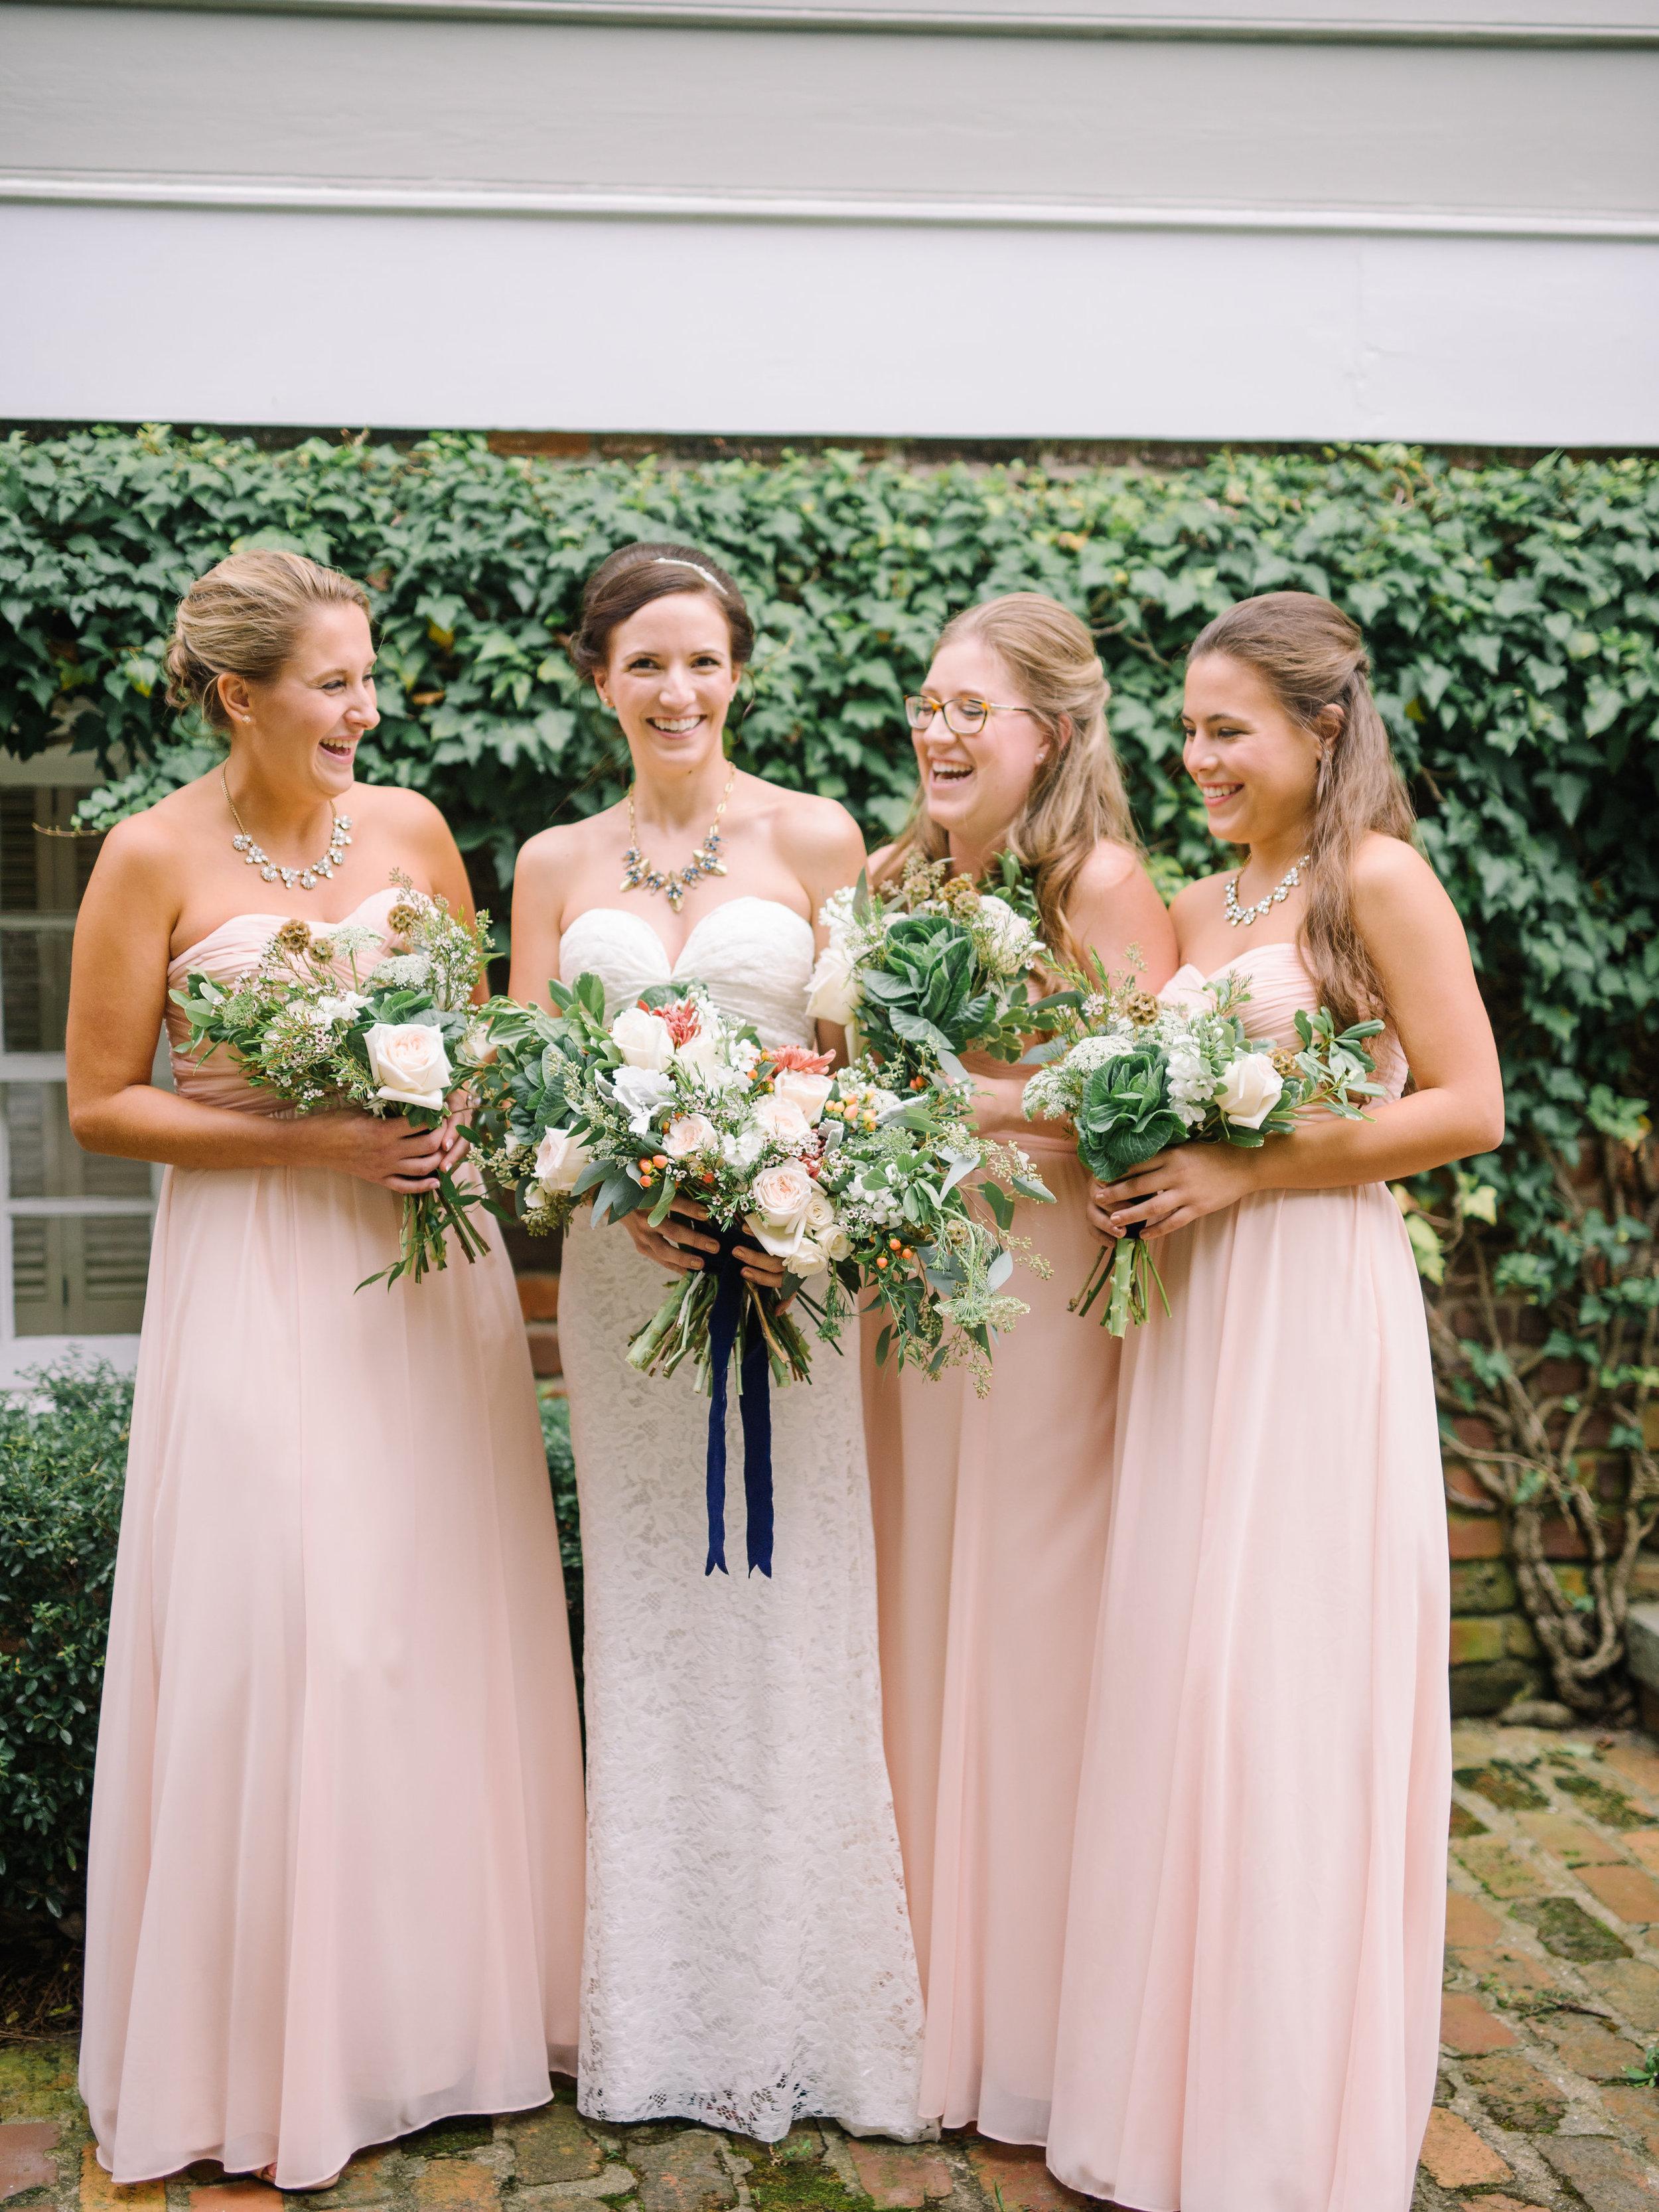 amber-and-paul-rach-loves-troy-charles-h-morris-center-wedding-sarah-seven-helene-lace-wedding-dress-ivory-and-beau-bridal-boutique-savannah-wedding-planner-savannah-event-designer-savannah-florist-savannah-weddings-savannah-bridal-boutique-15.jpg